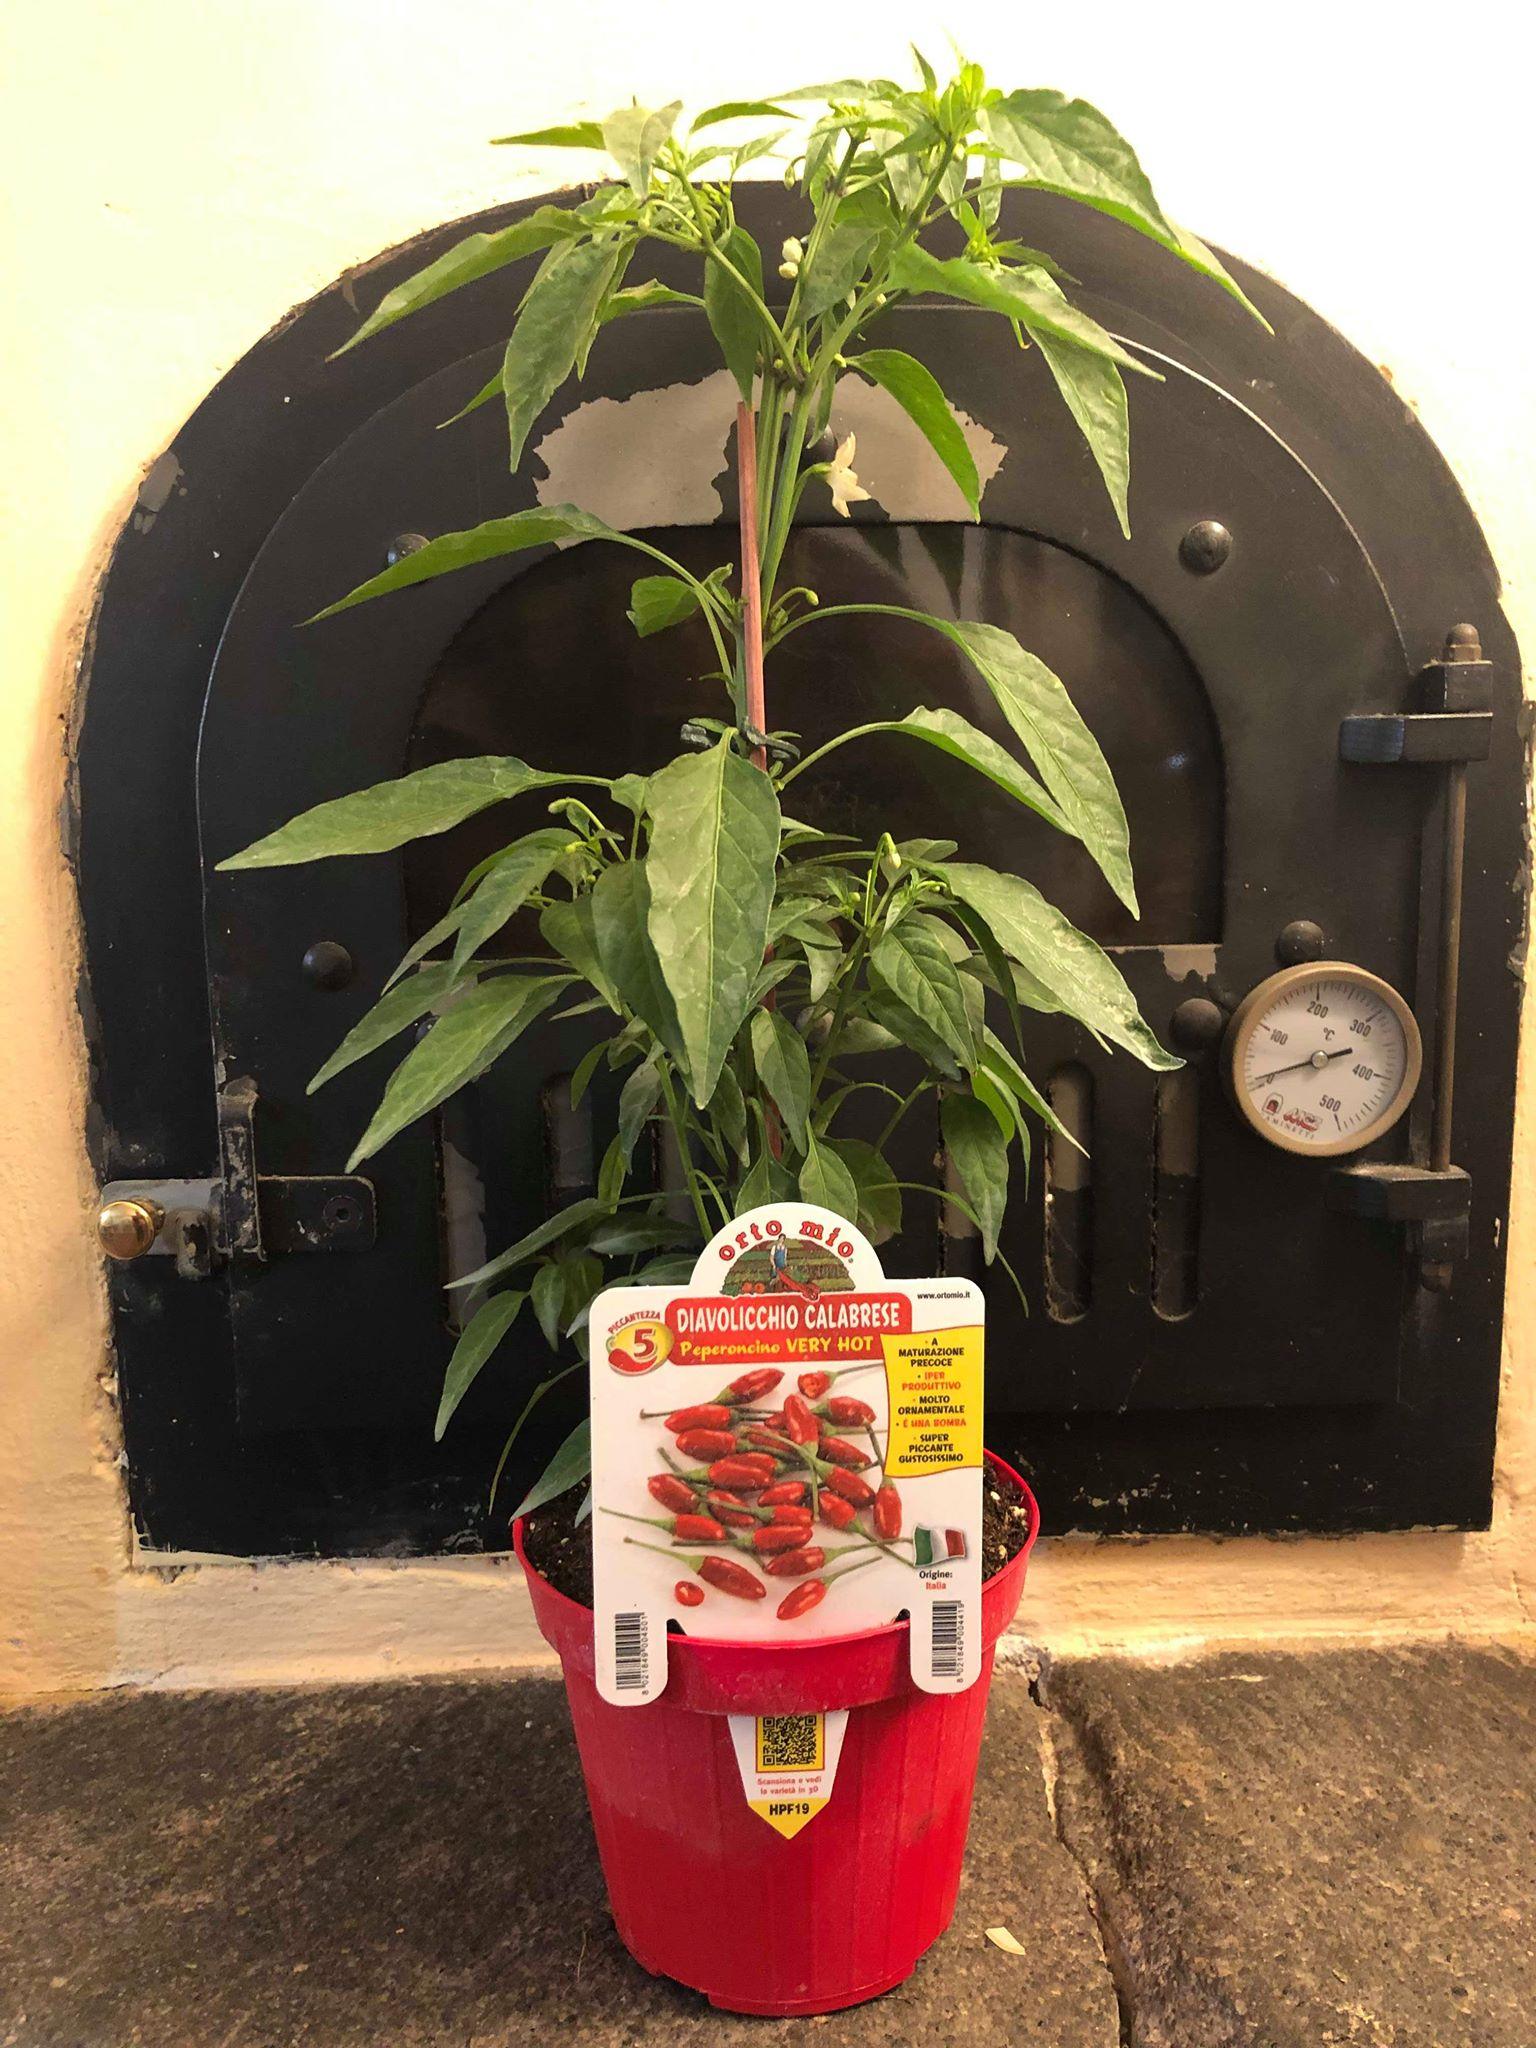 Hot Pepper Calabrese VERY HOT diavolicchio Italico Pot Plant - Orto mio